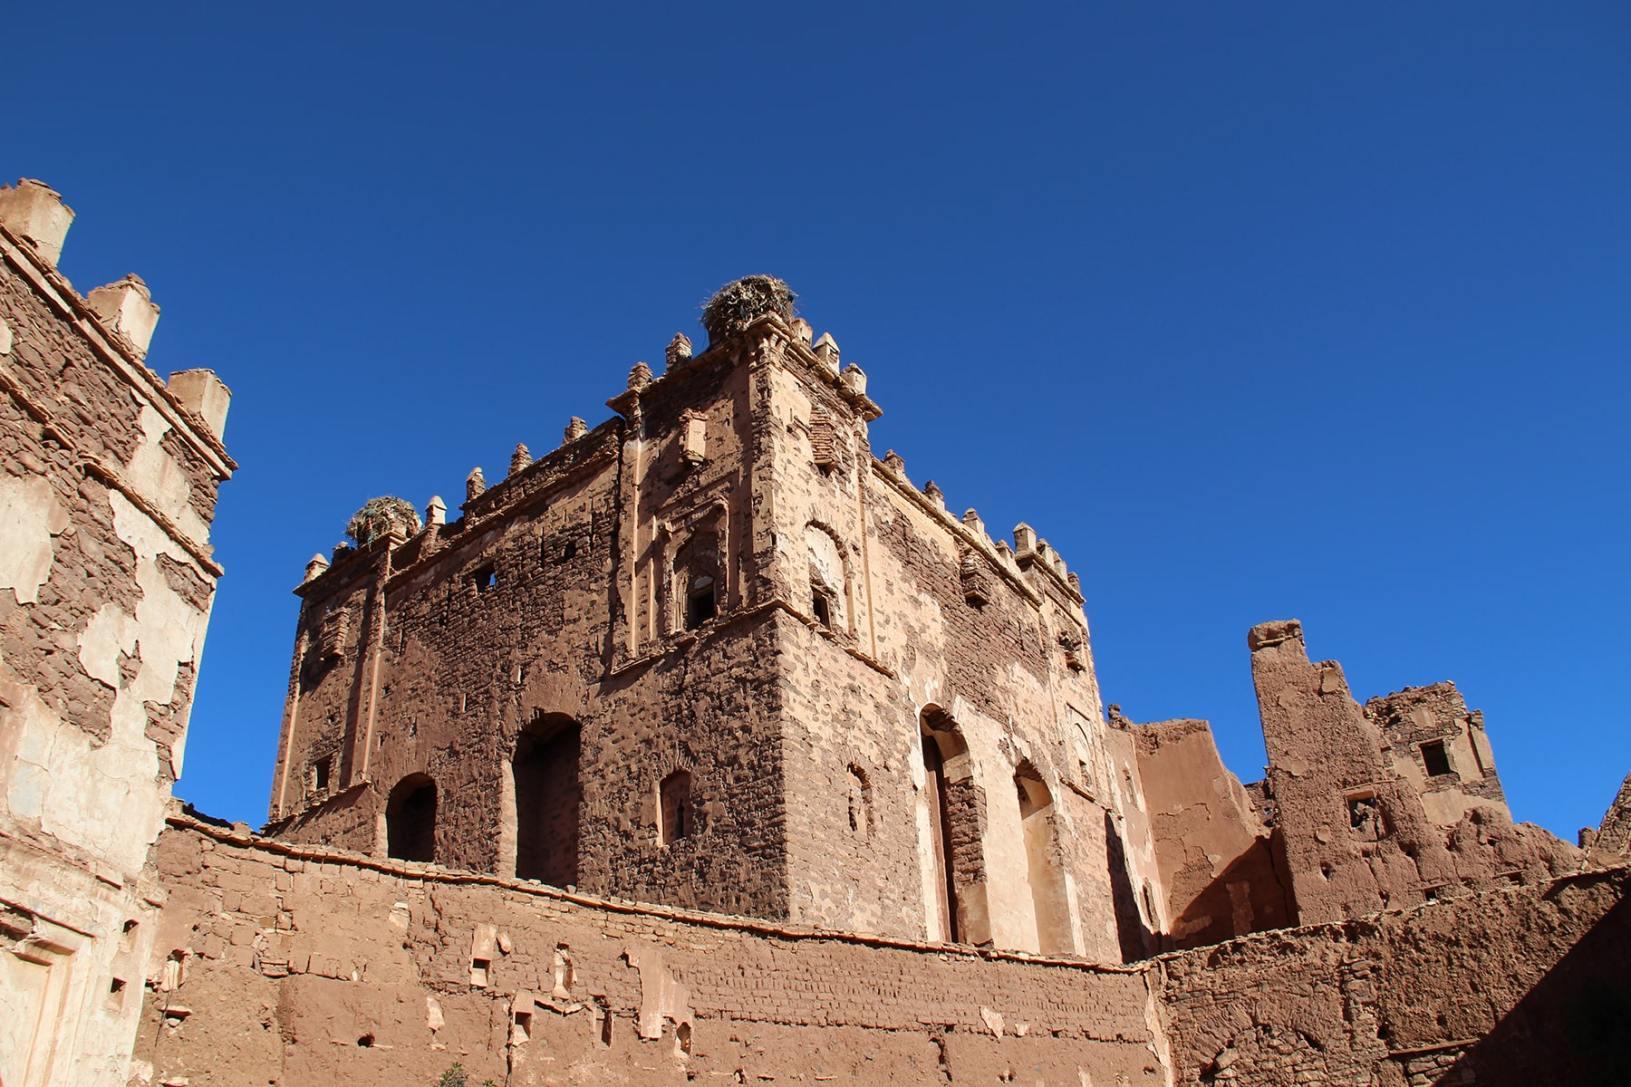 L'esterno della kasbah di Telouet